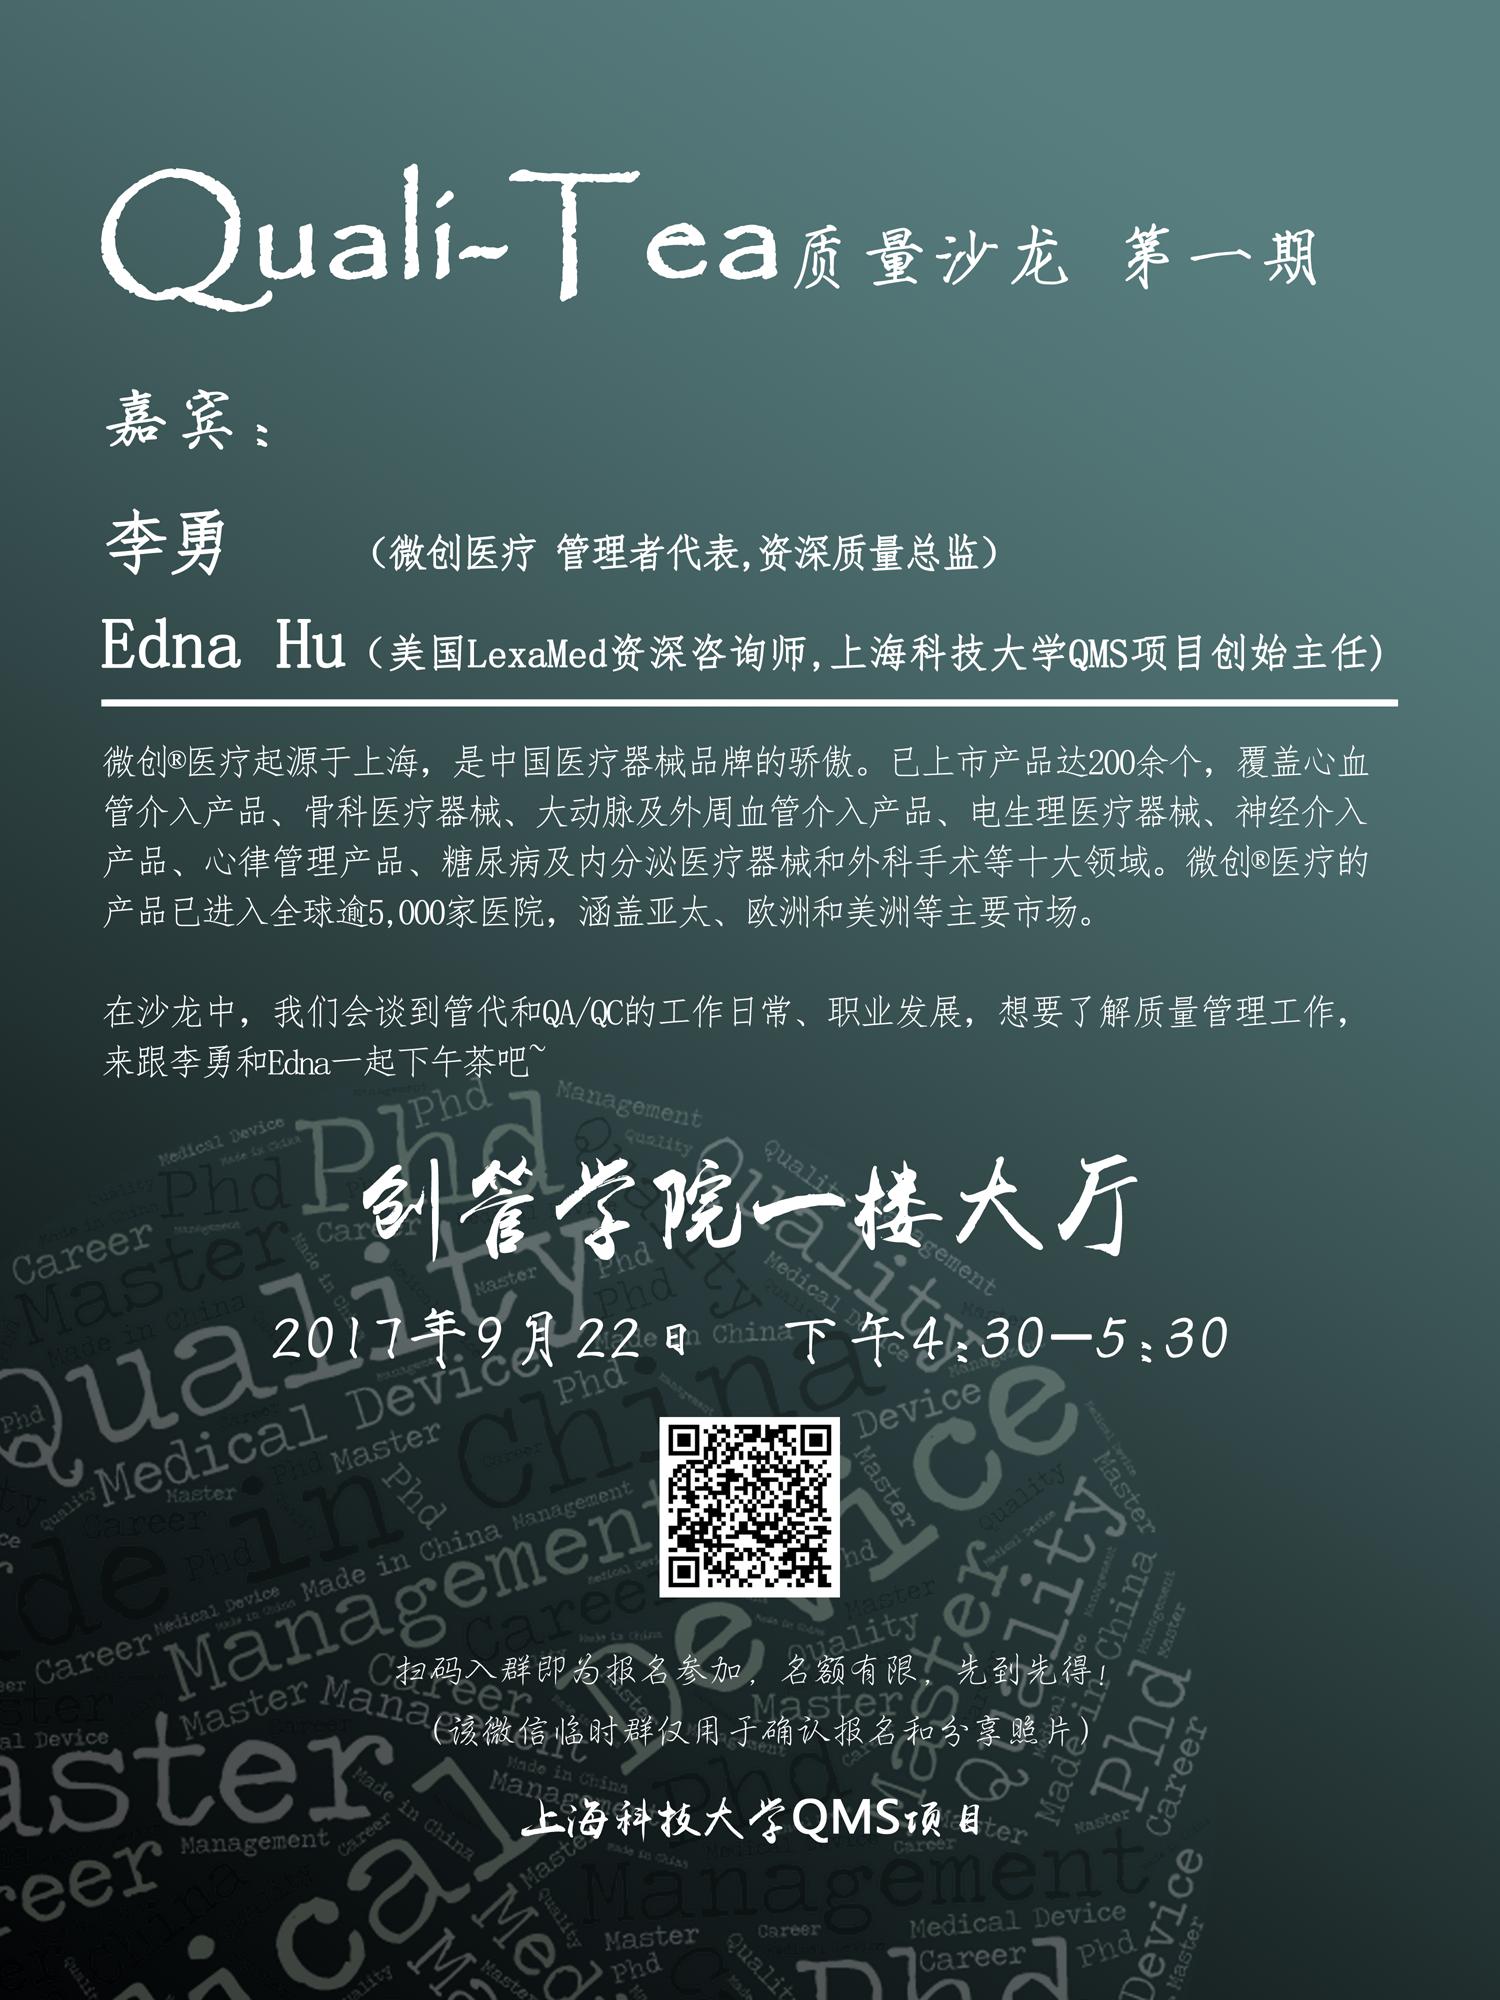 Quali-Tea20170922海报.jpg